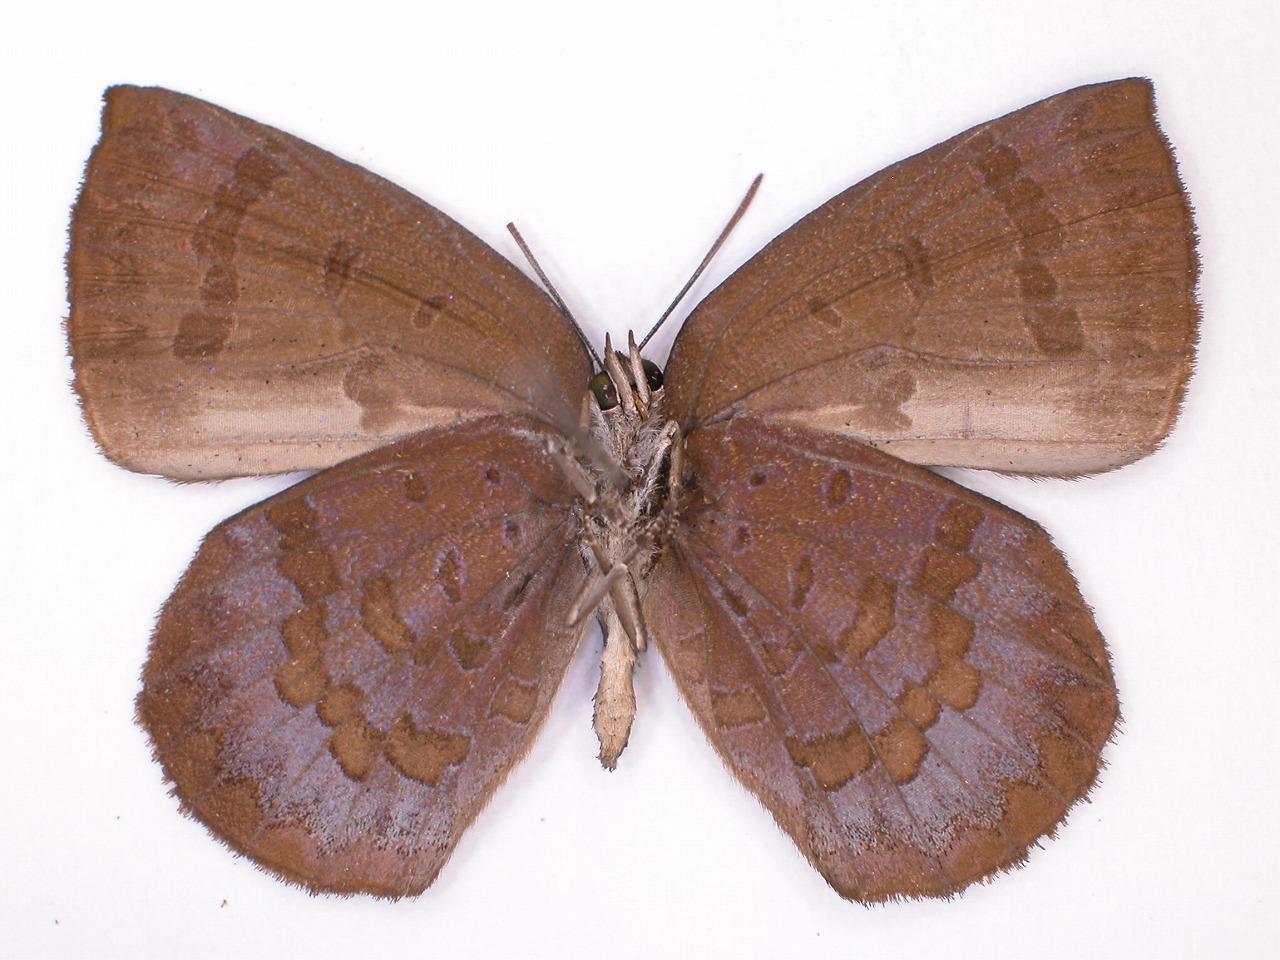 https://www.hitohaku.jp/material/l-material/butterfly-wing/5-lycaenidae/B1-638585_B.jpg